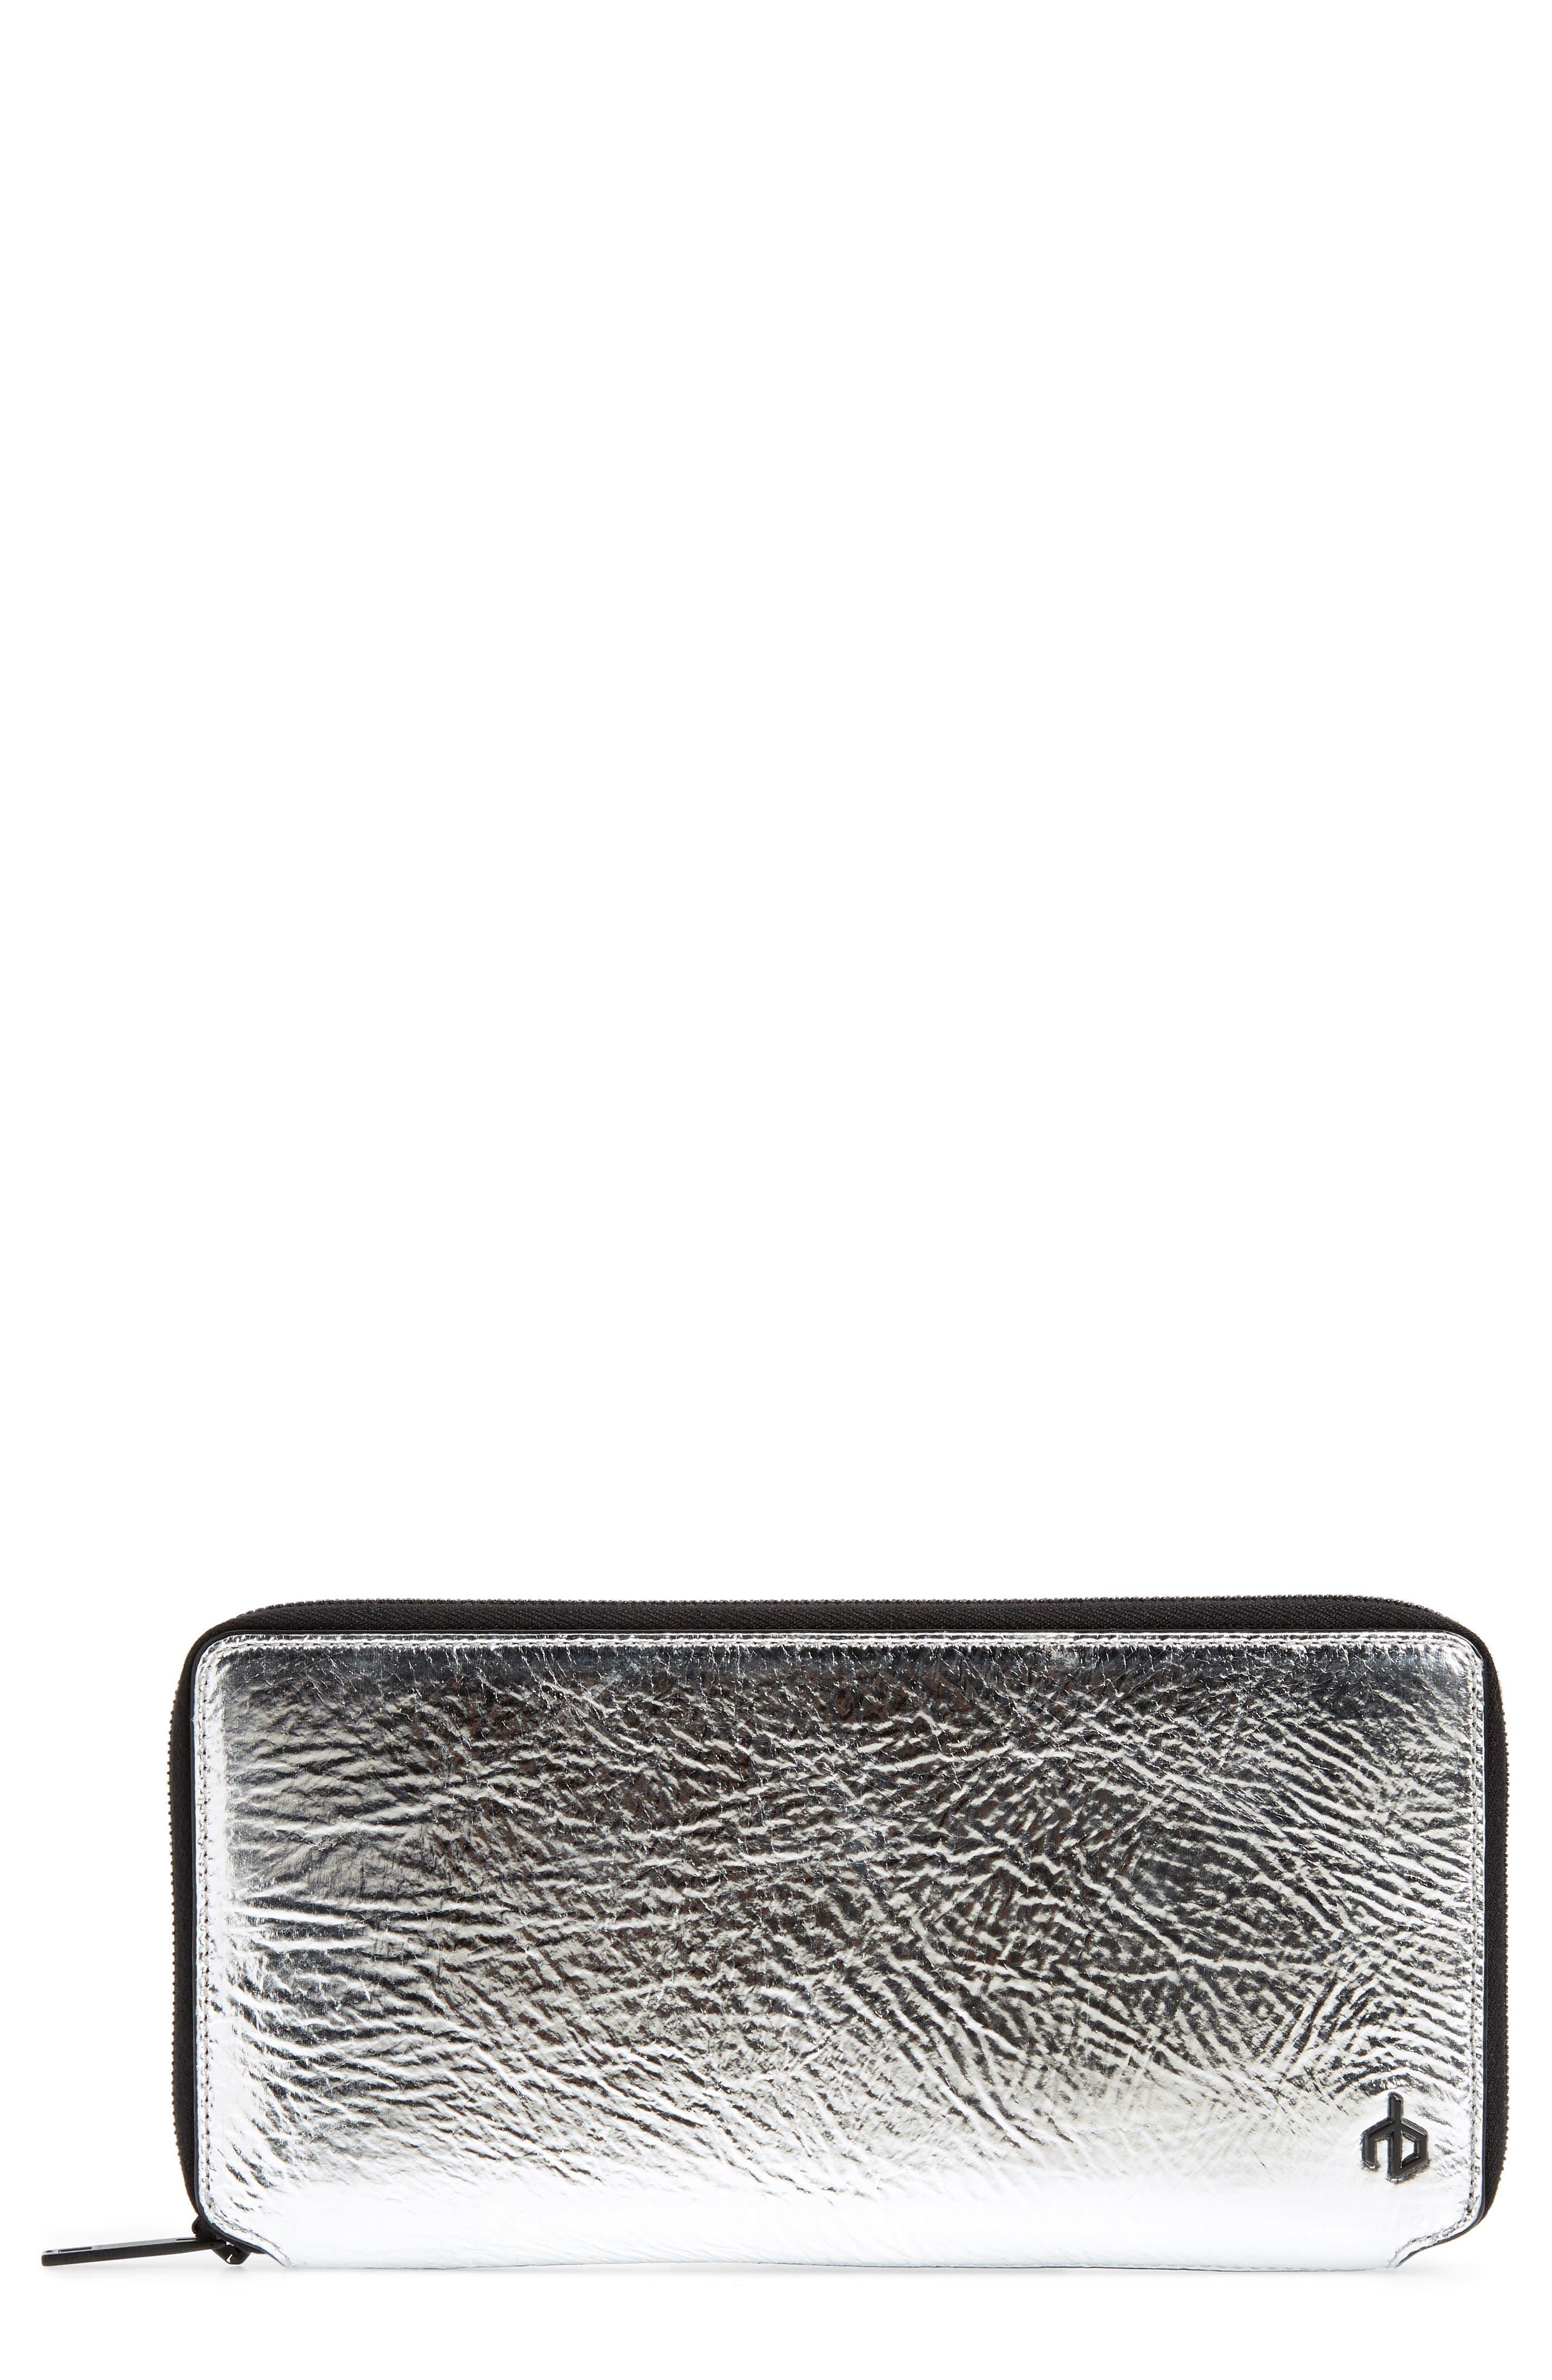 Croc Metallic Lambskin Leather Wallet,                             Main thumbnail 1, color,